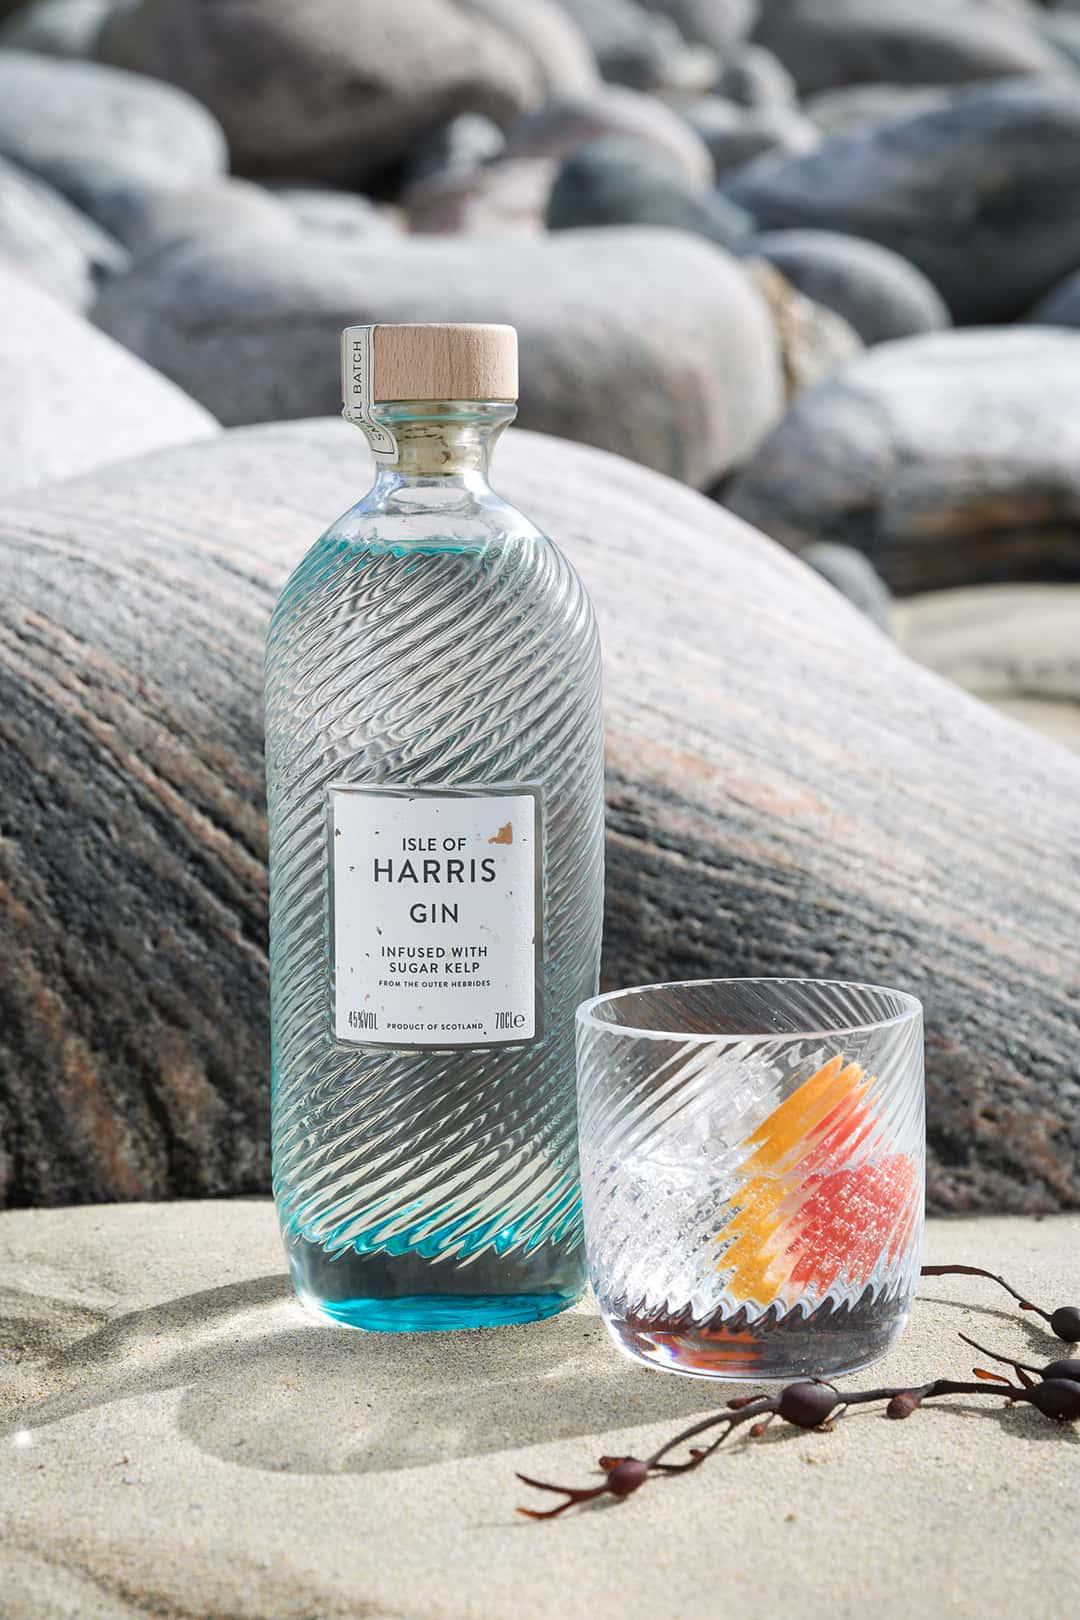 Isle of Harris Gin bottle sitting on sea rocks with a G&T